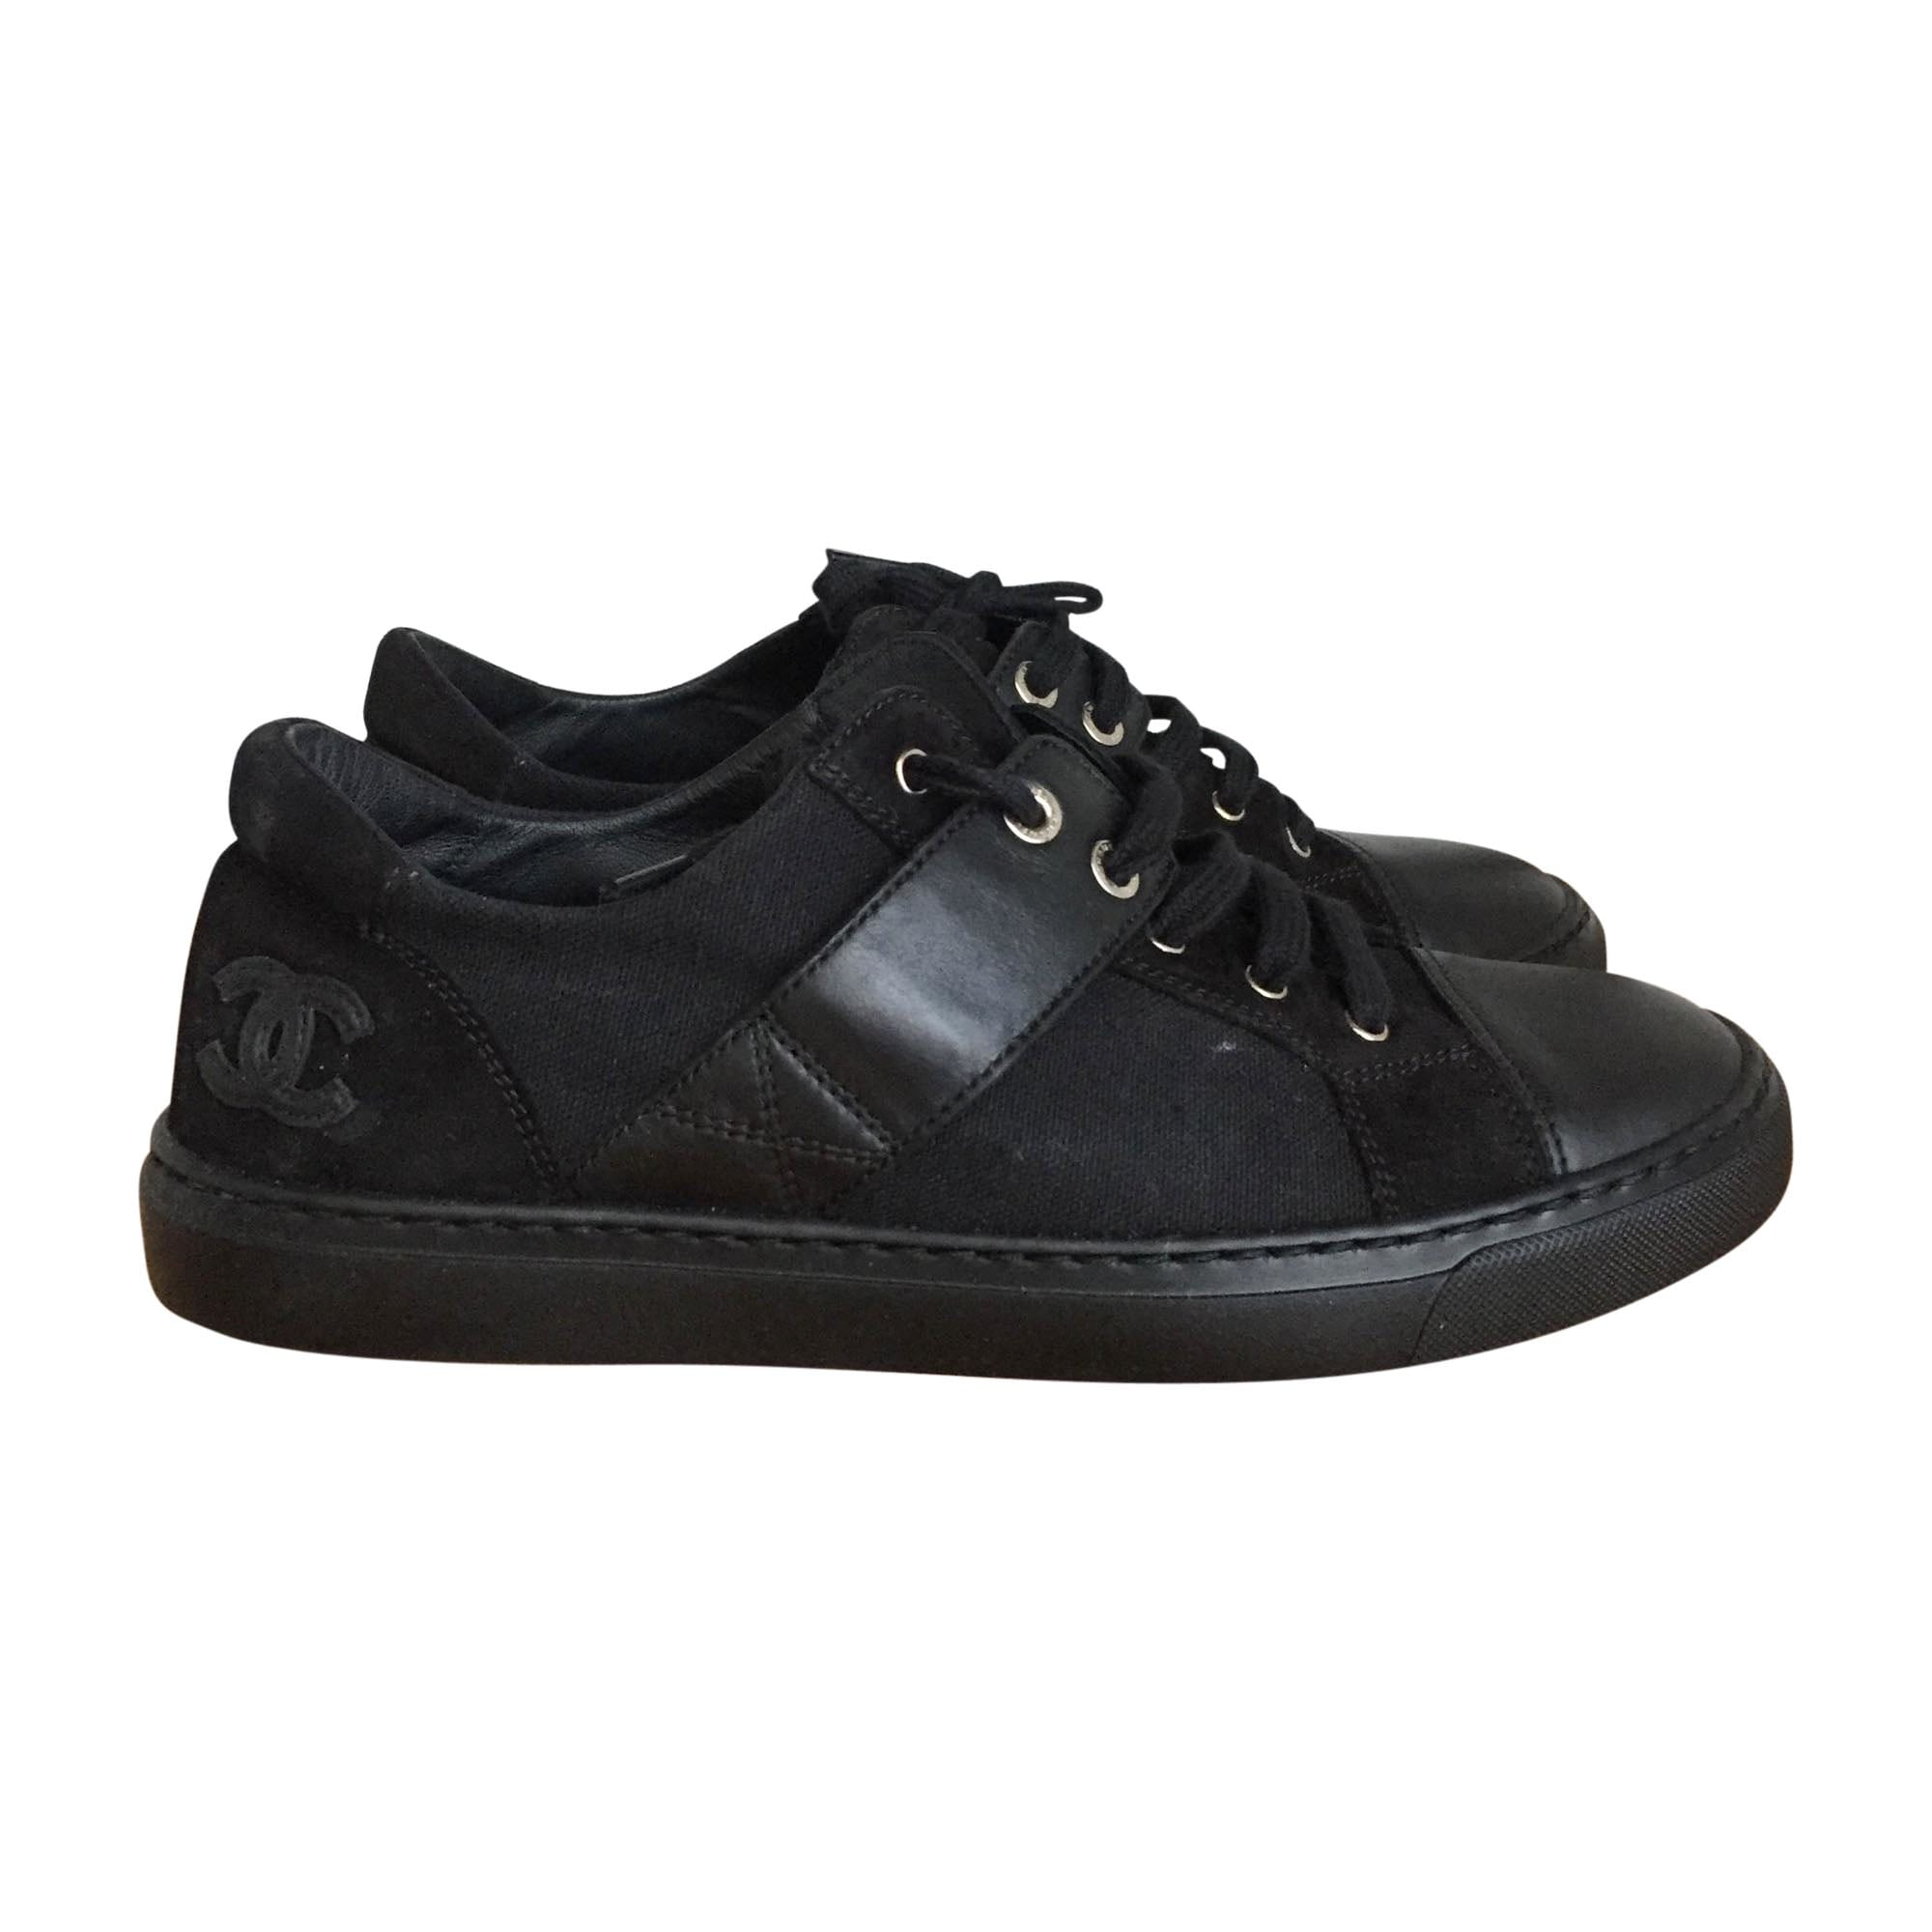 Baskets CHANEL 37,5 noir - 8325117 f926b737a09